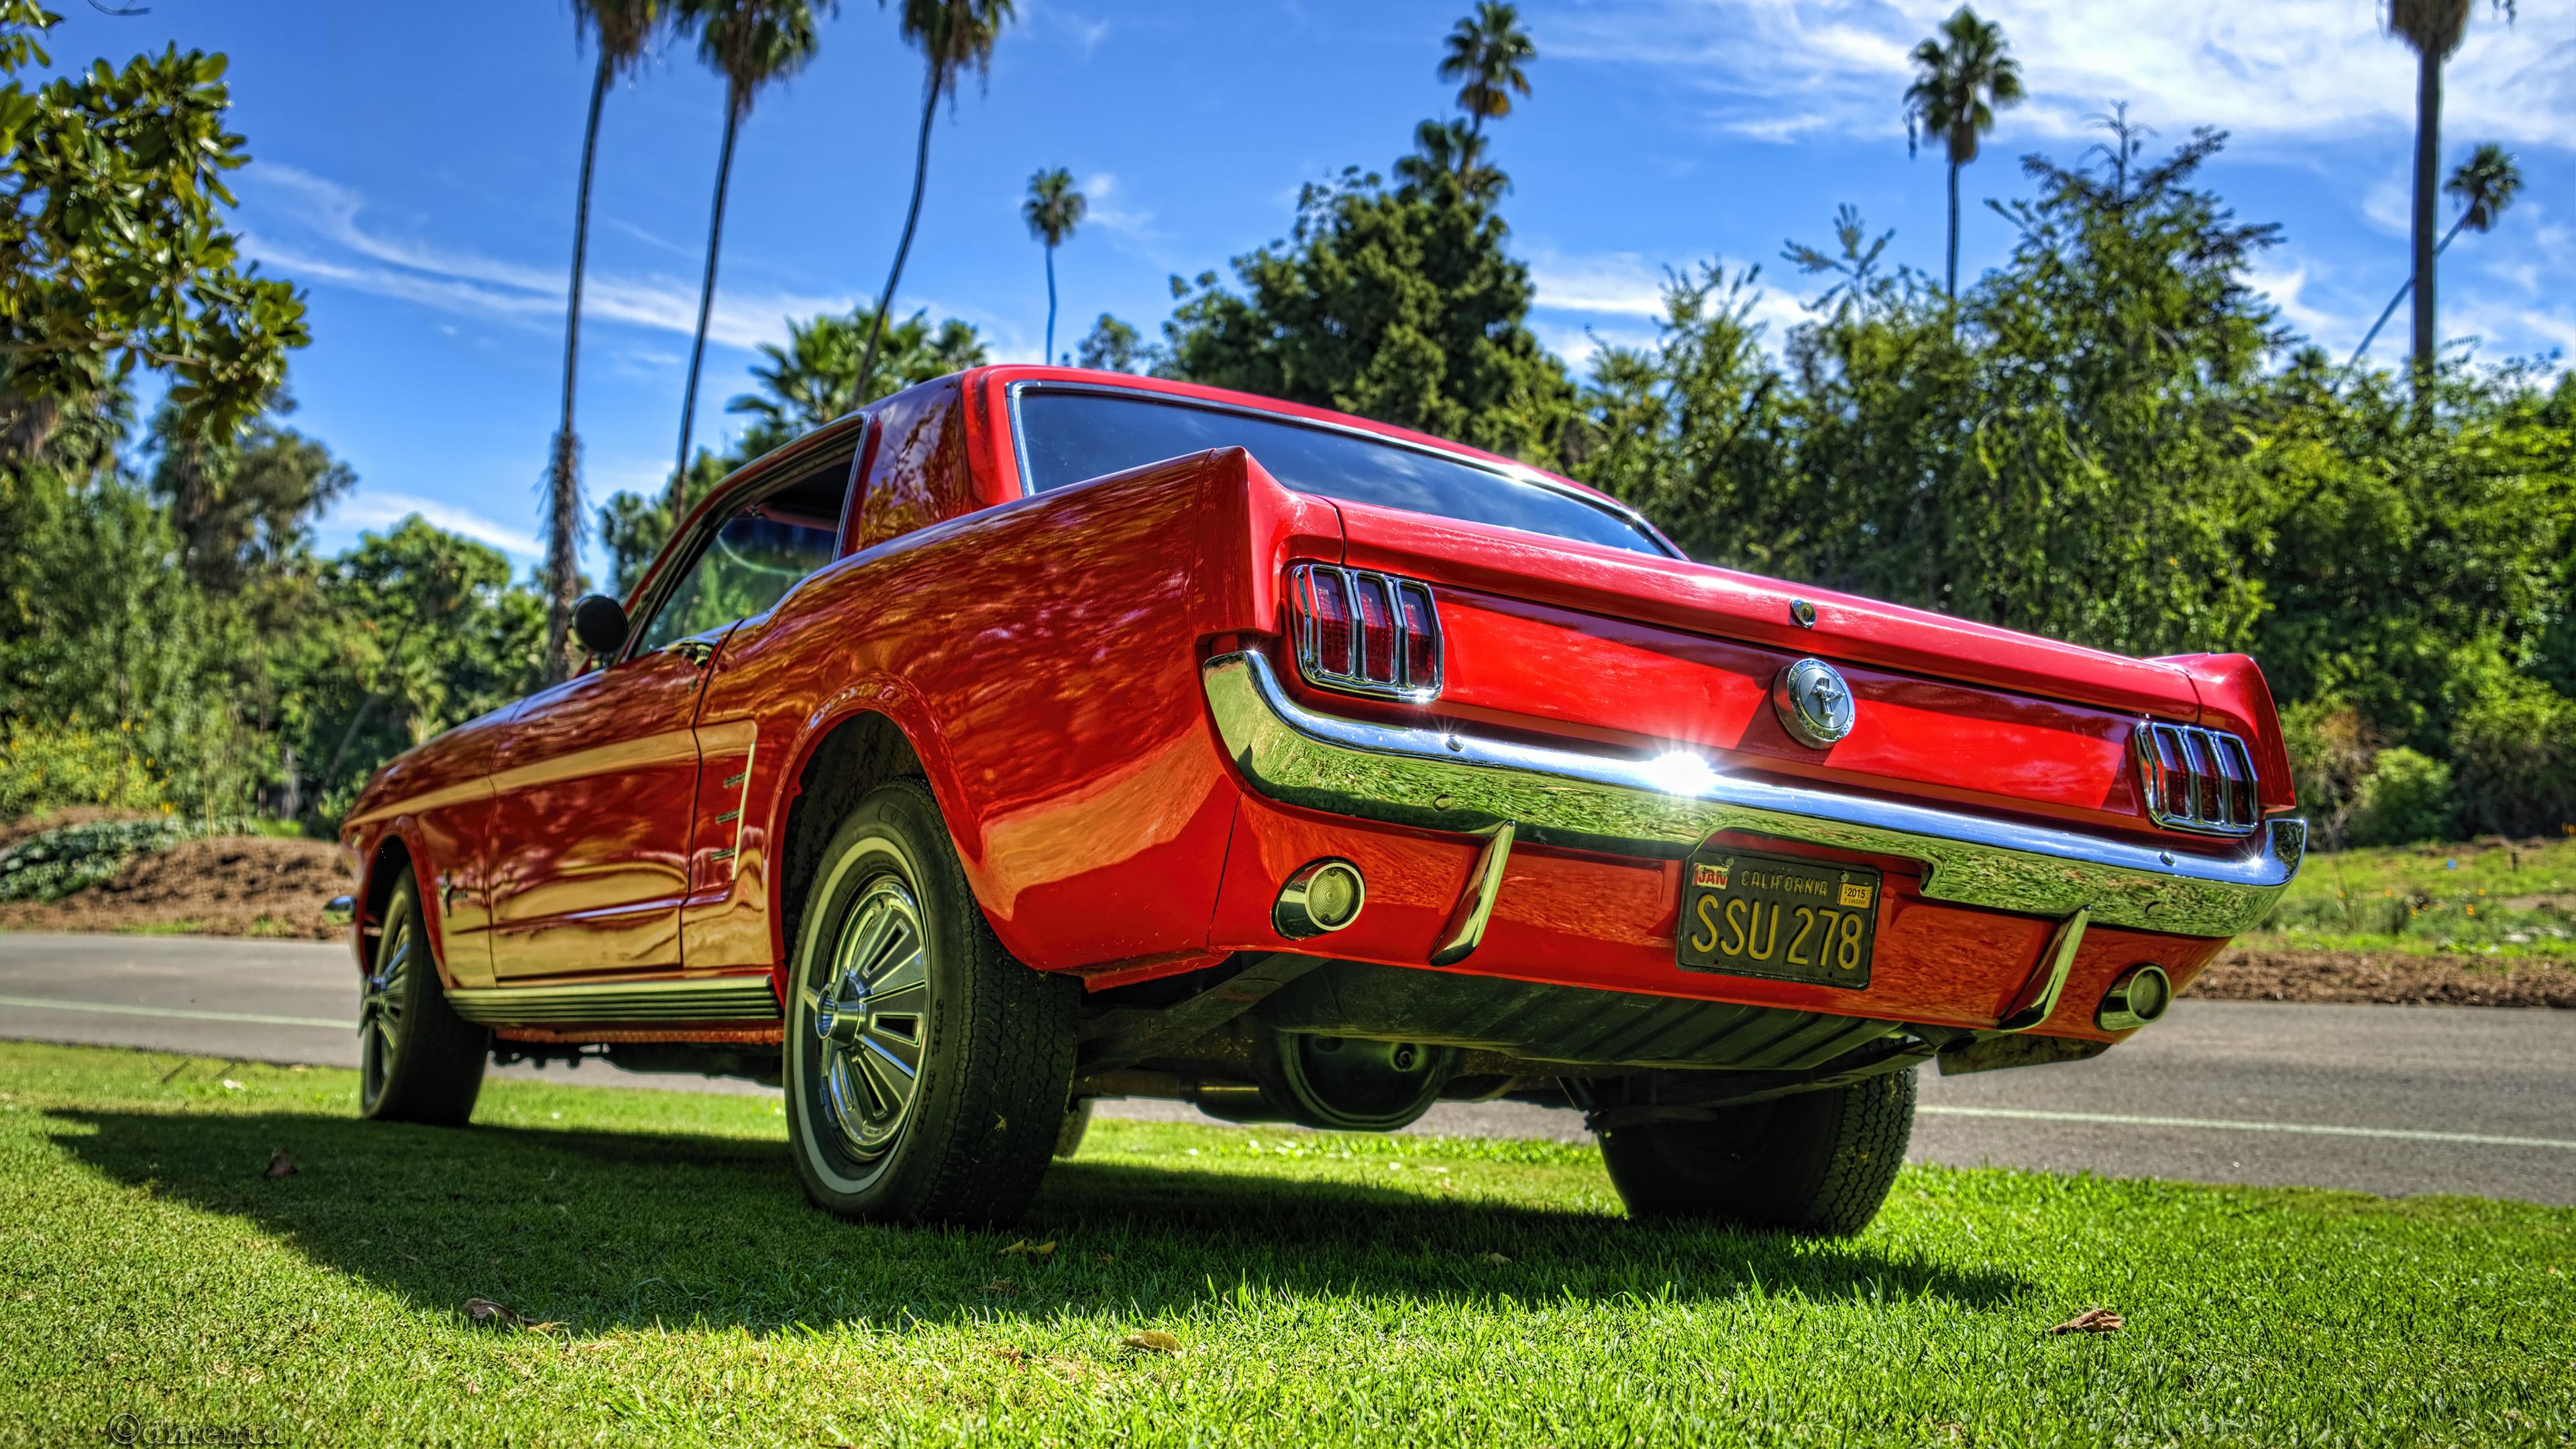 Ford Mustang Mach 1 4k Ultrahd Wallpaper Backiee Free Ultra Hd